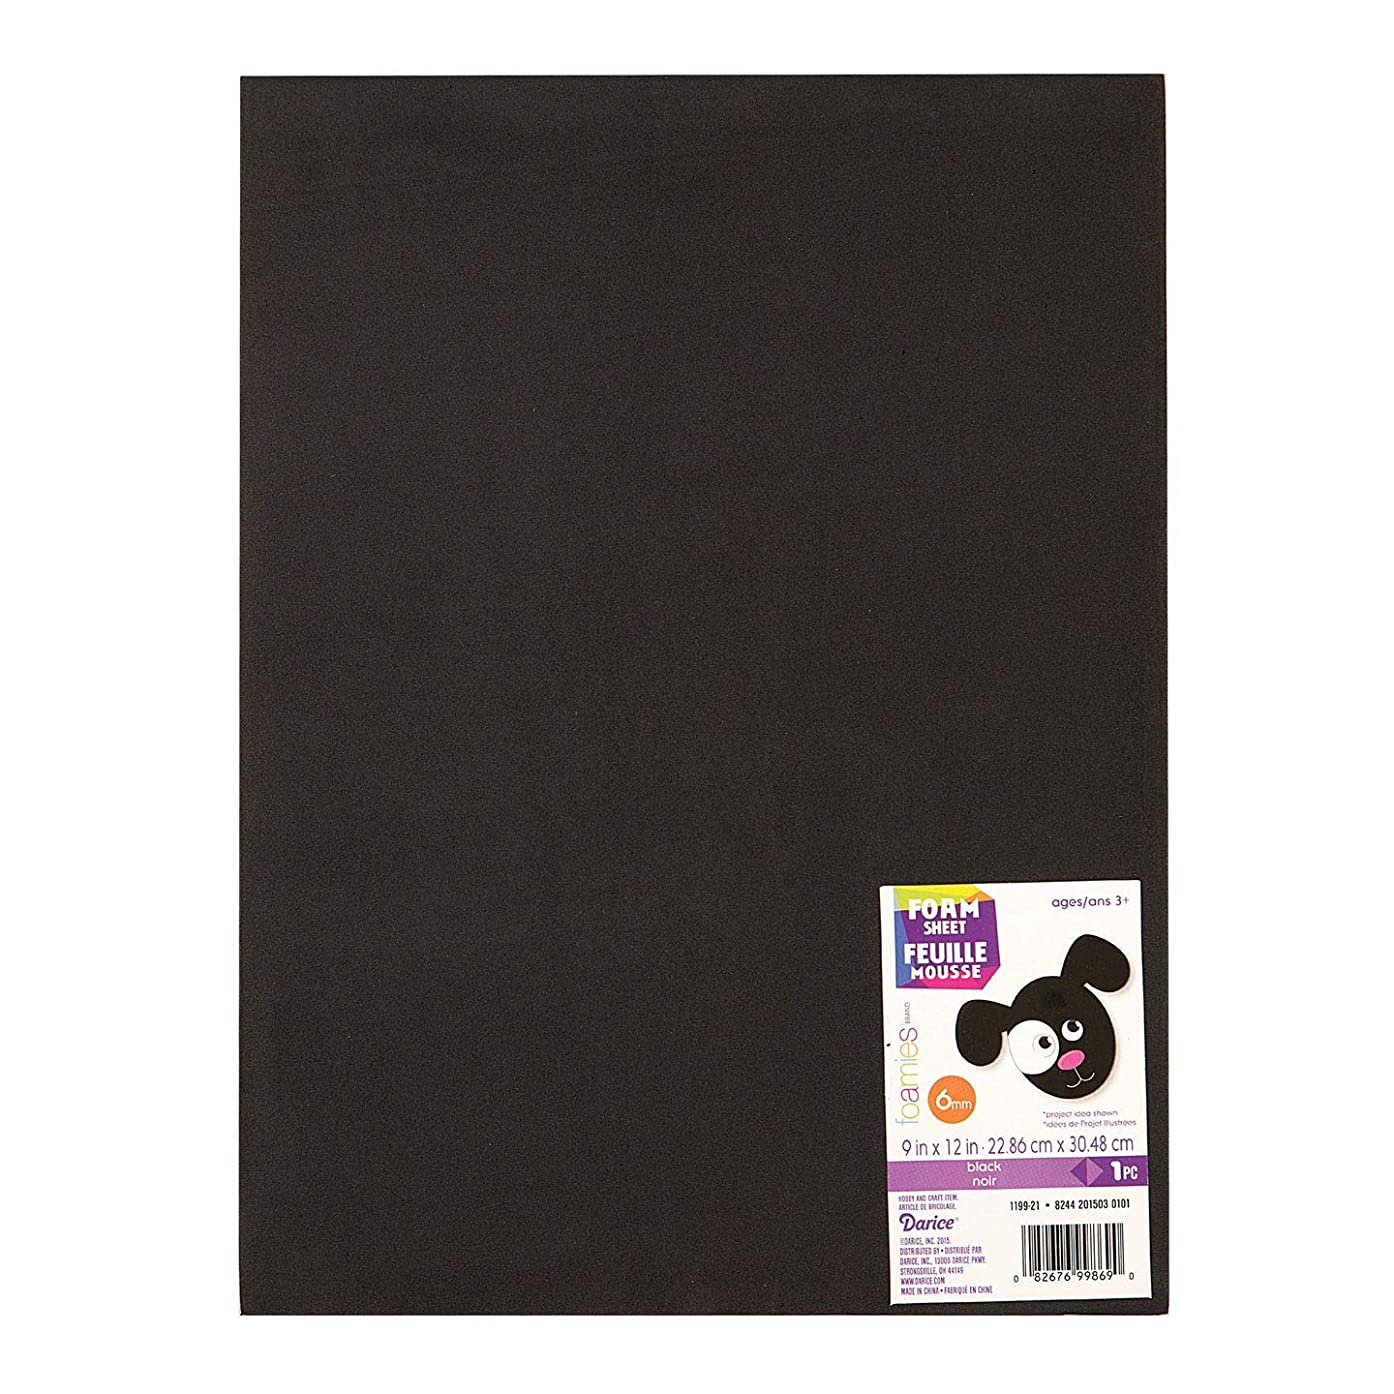 Darice Bulk Buy DIY Foamies Extra Thick Foam Sheet Black 6mm Thick 9 x 12 inches (10-Pack) 1199-21